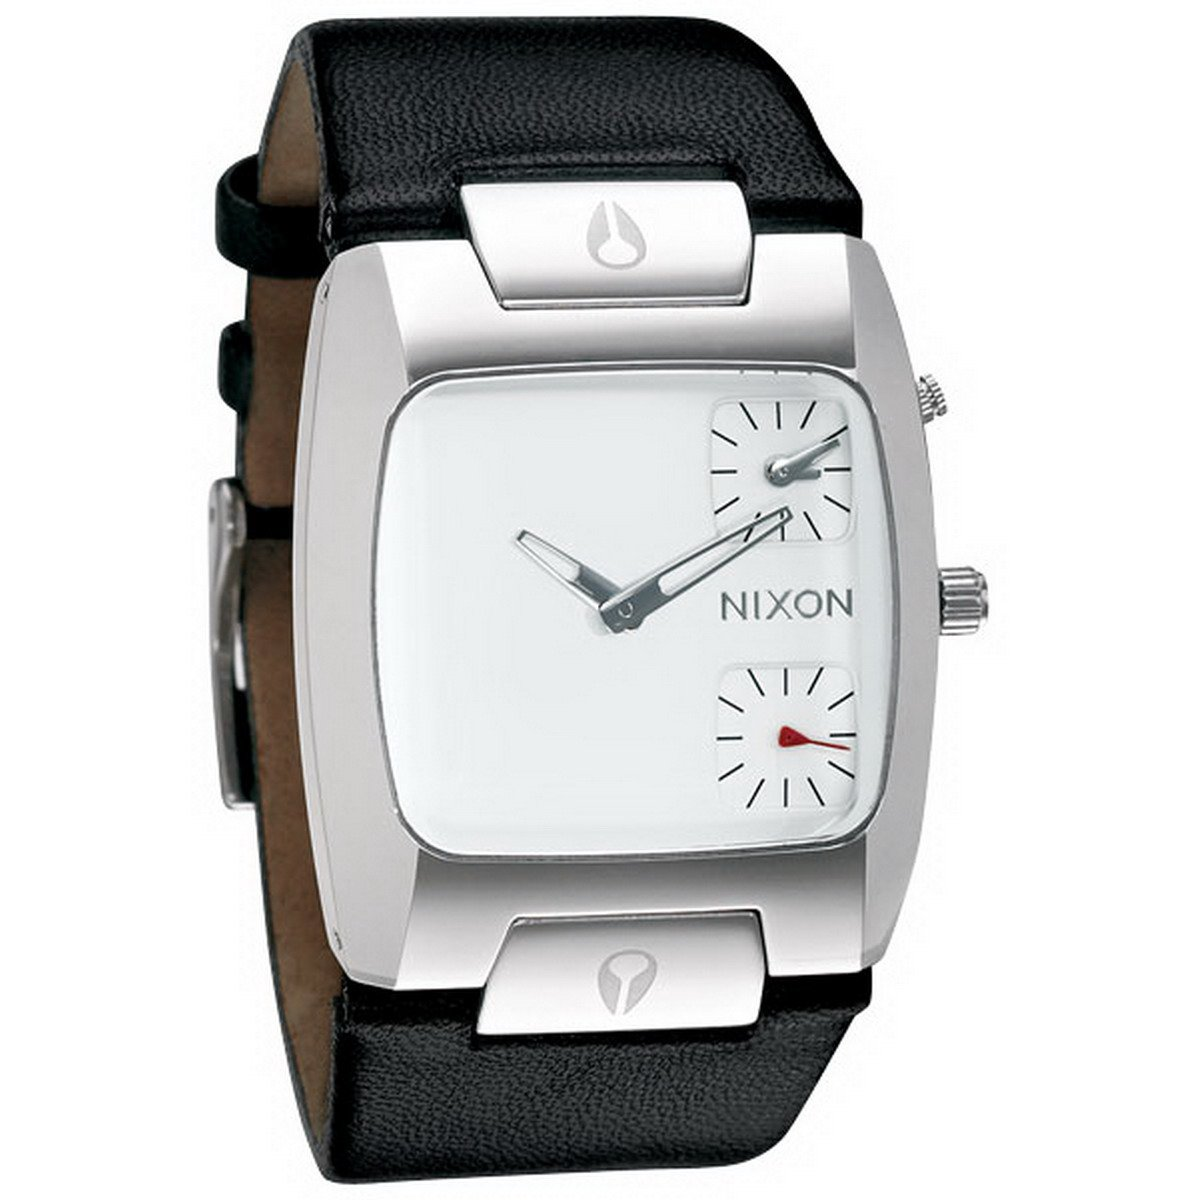 ce0feec608 Nixon Men s Banks Leather A086100 Black Leather Quartz Watch with White  Dial  Nixon  Amazon.ca  Watches